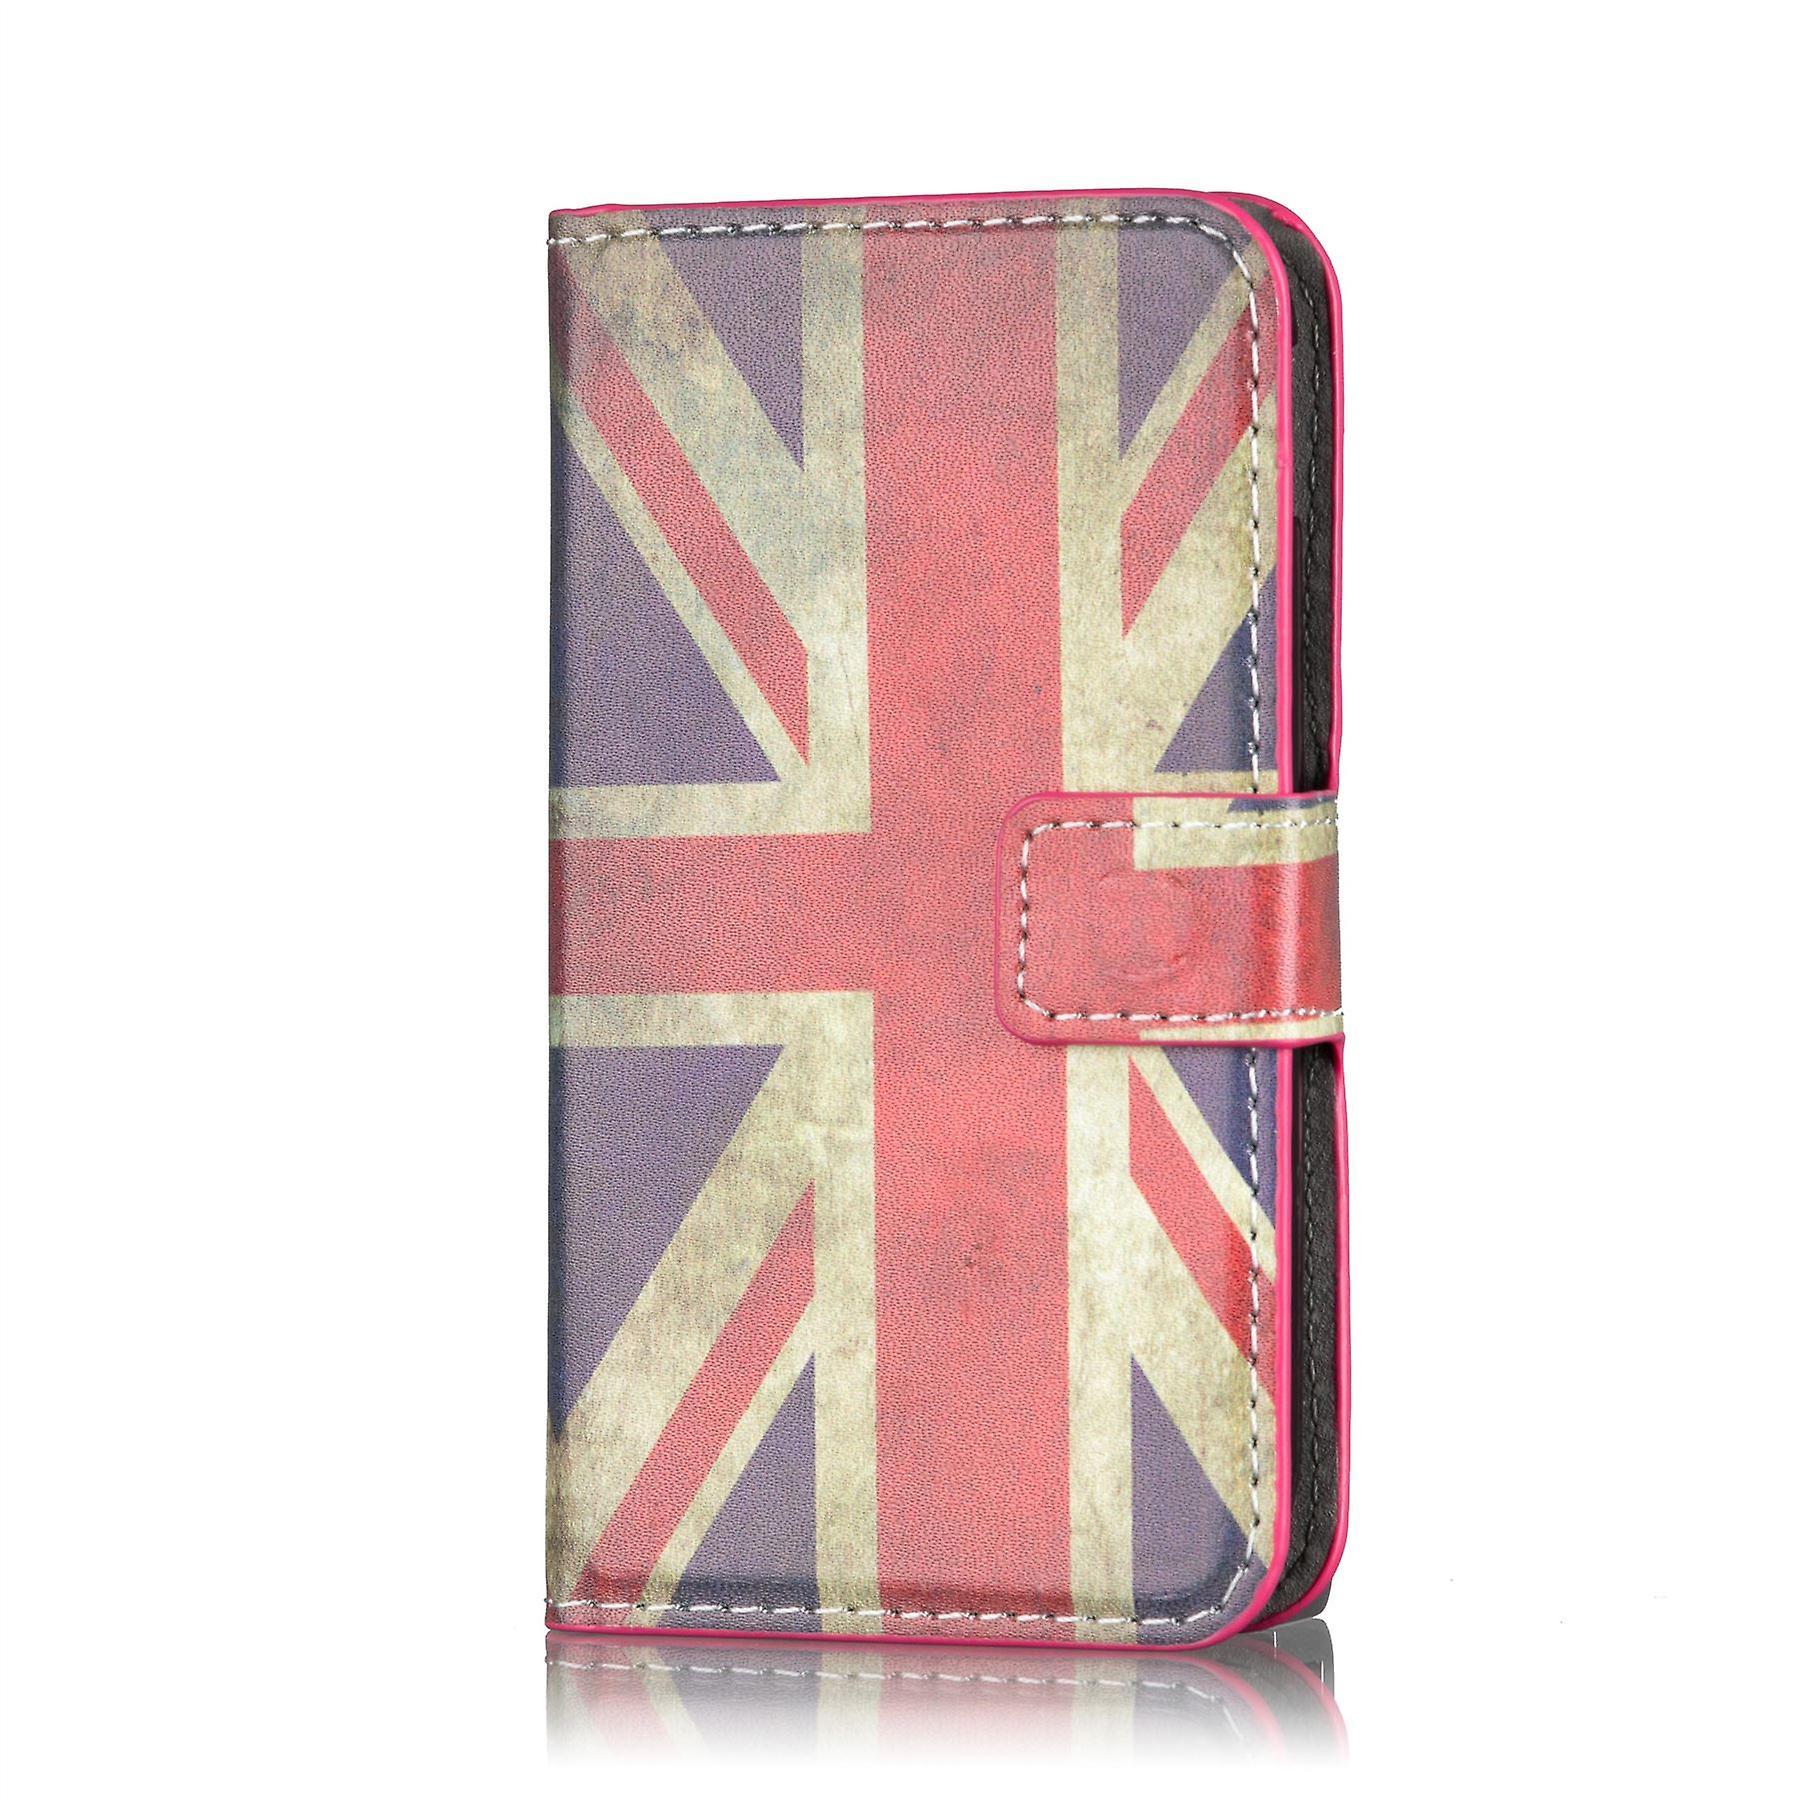 Design Book wallet PU leather case for Nokia Lumia 1520 - Union Jack UK Flag